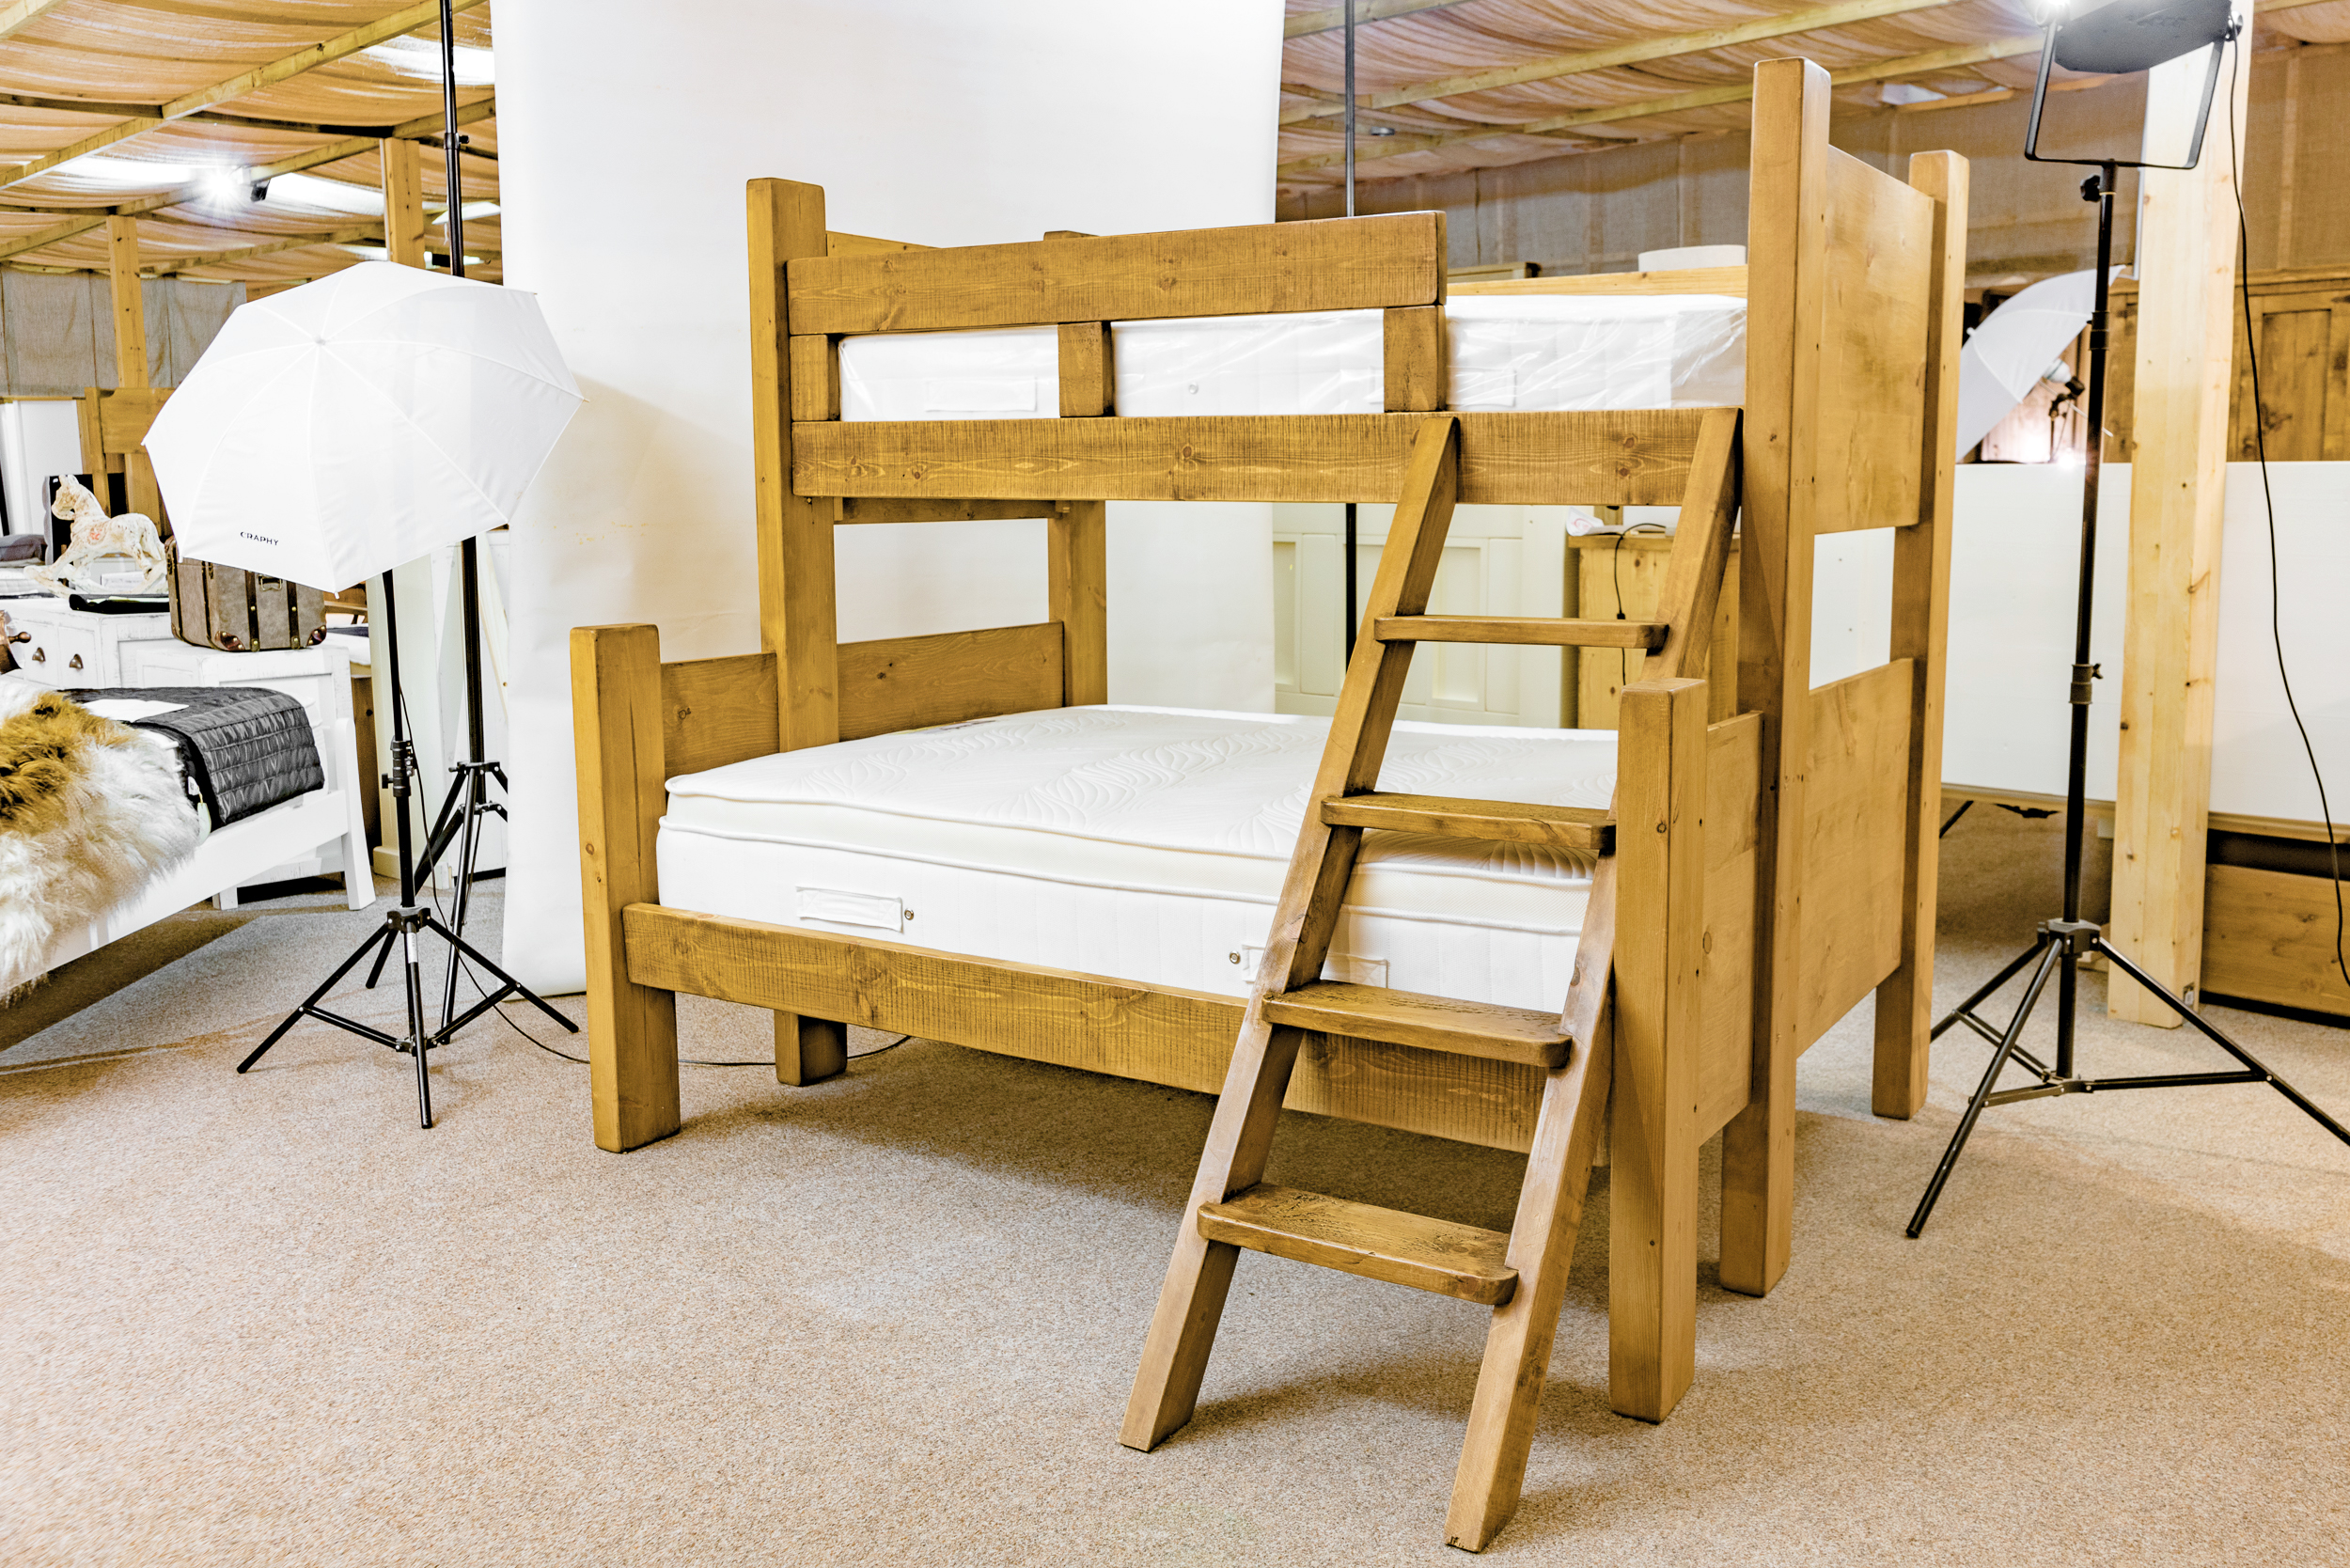 Alexander Ellis - Rustic Bedroom